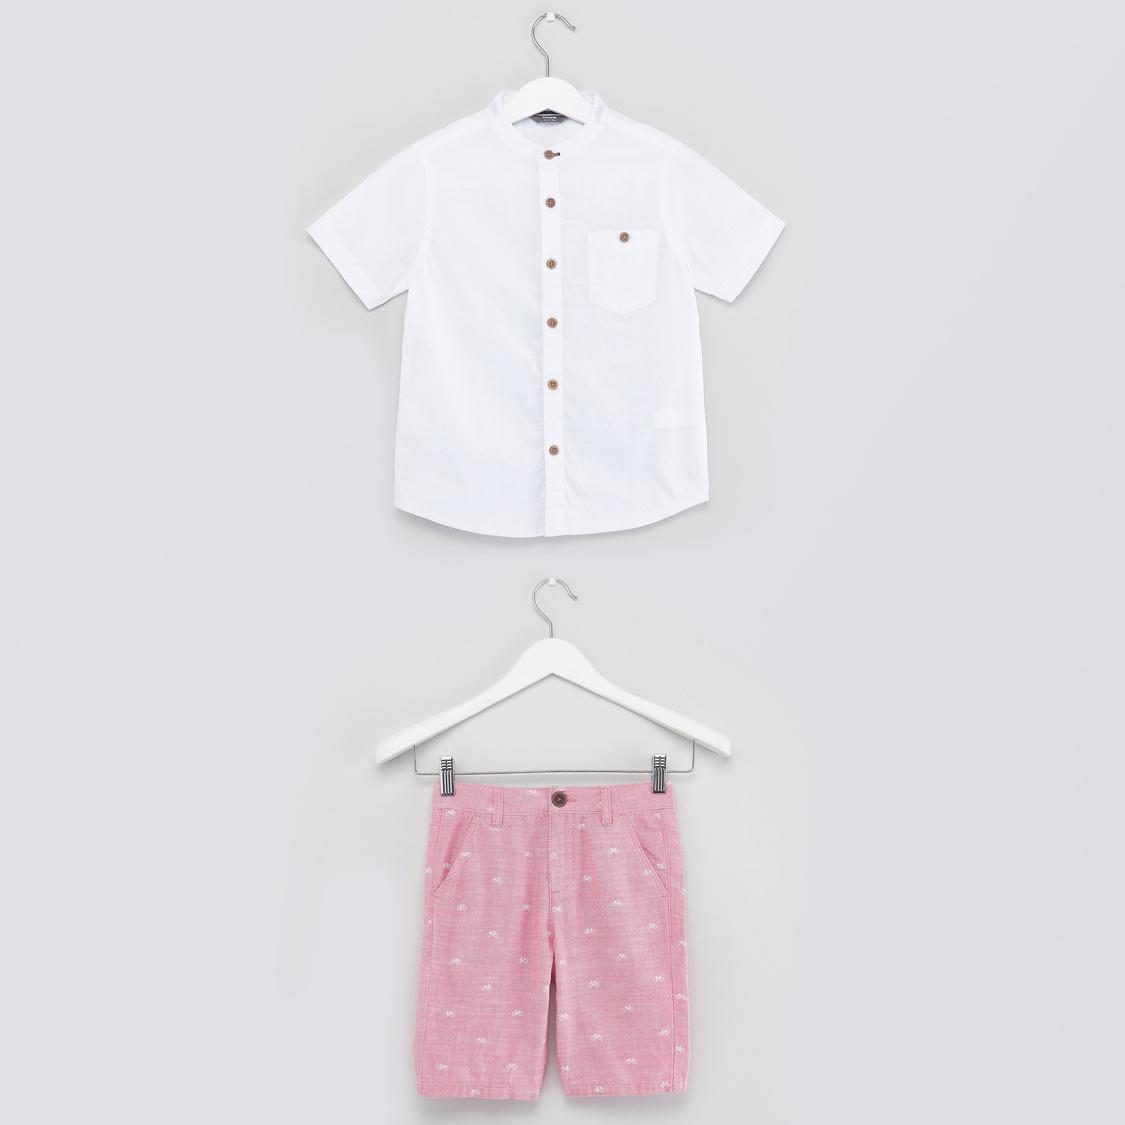 Solid Short Sleeves Shirt with Printed Shorts